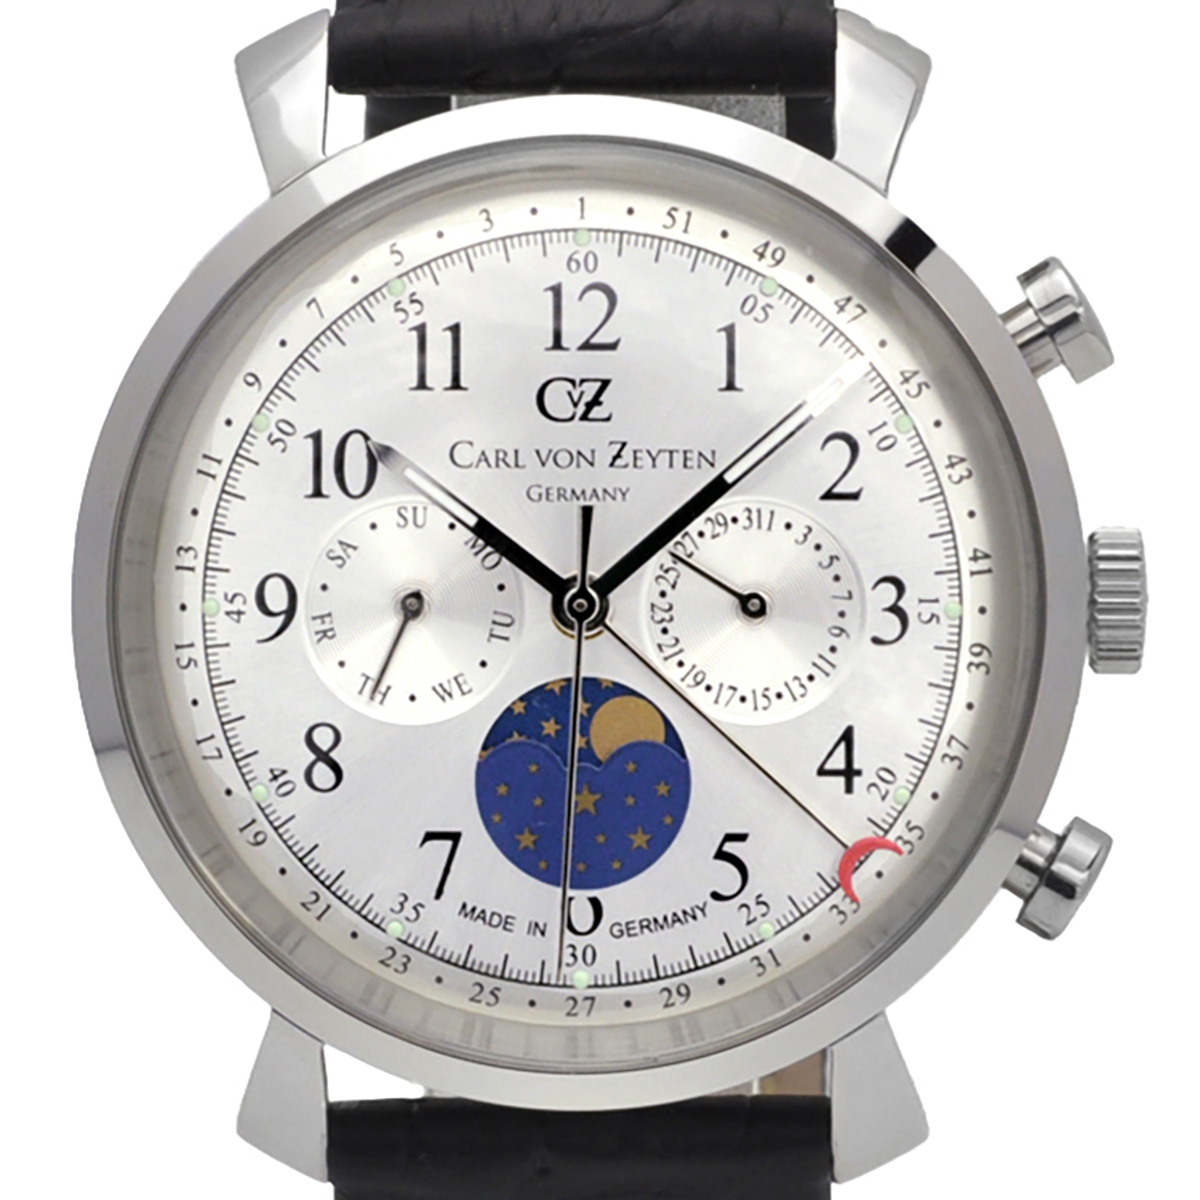 Carl von Zeyten カール・フォン・ツォイテン 電池式クォーツ 腕時計 [CvZ0015SL] 正規品  カレンダー デイ&ナイト(サン&ムーン)